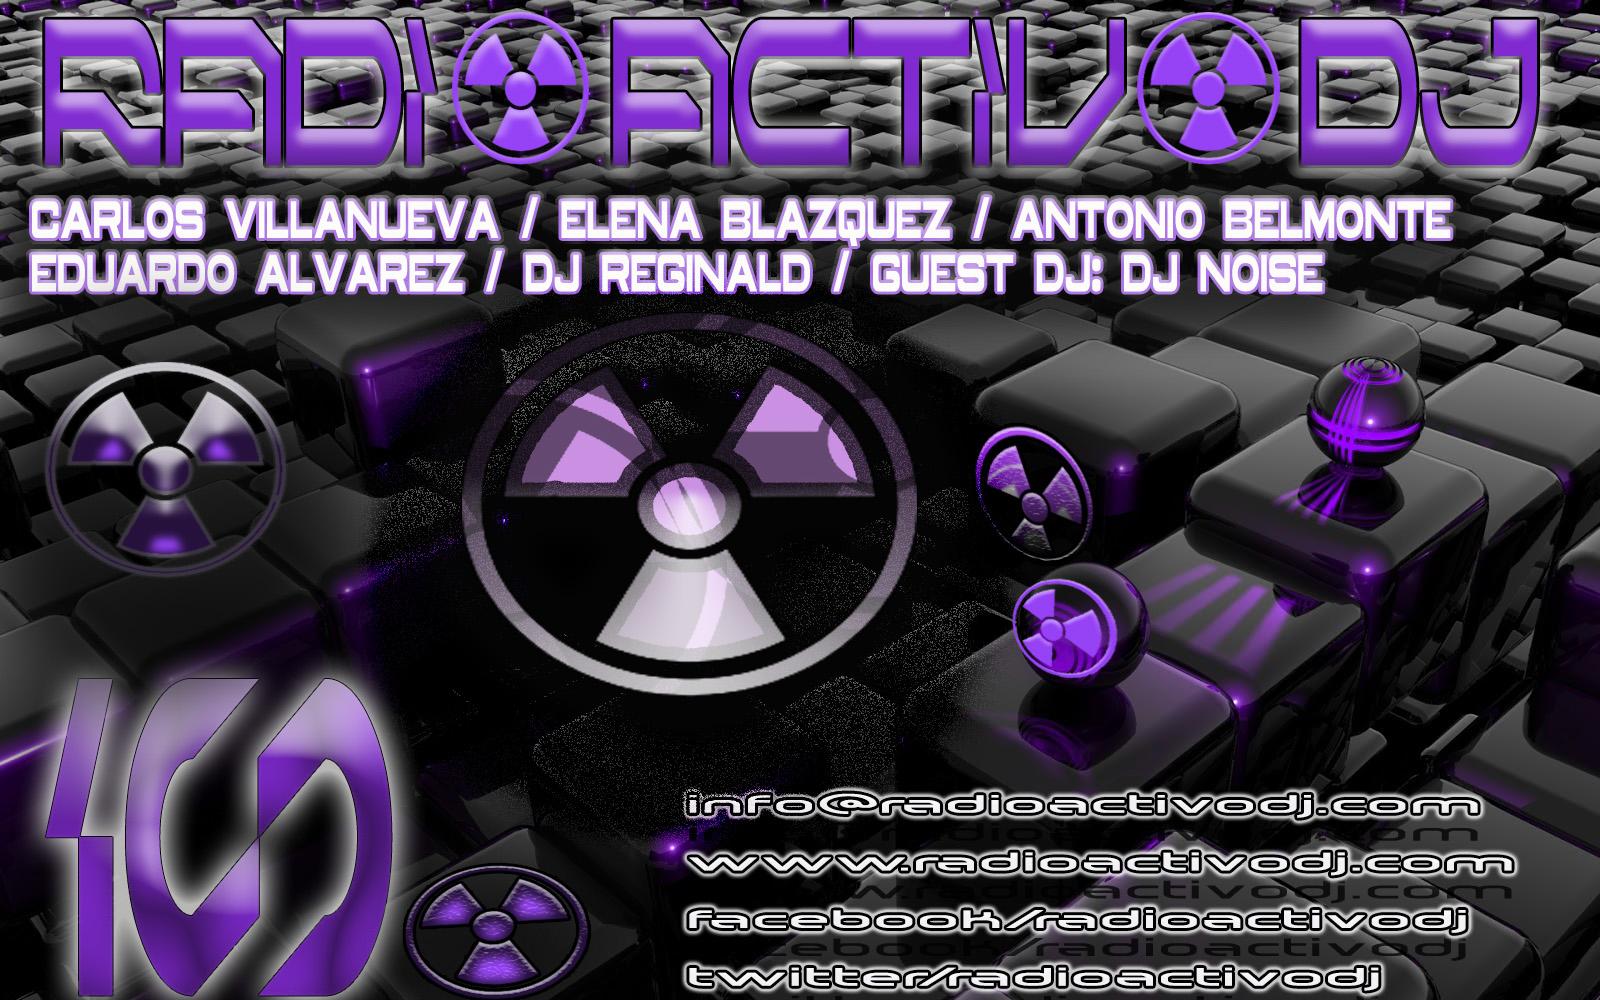 RADIOACTIVO DJ 10-2015